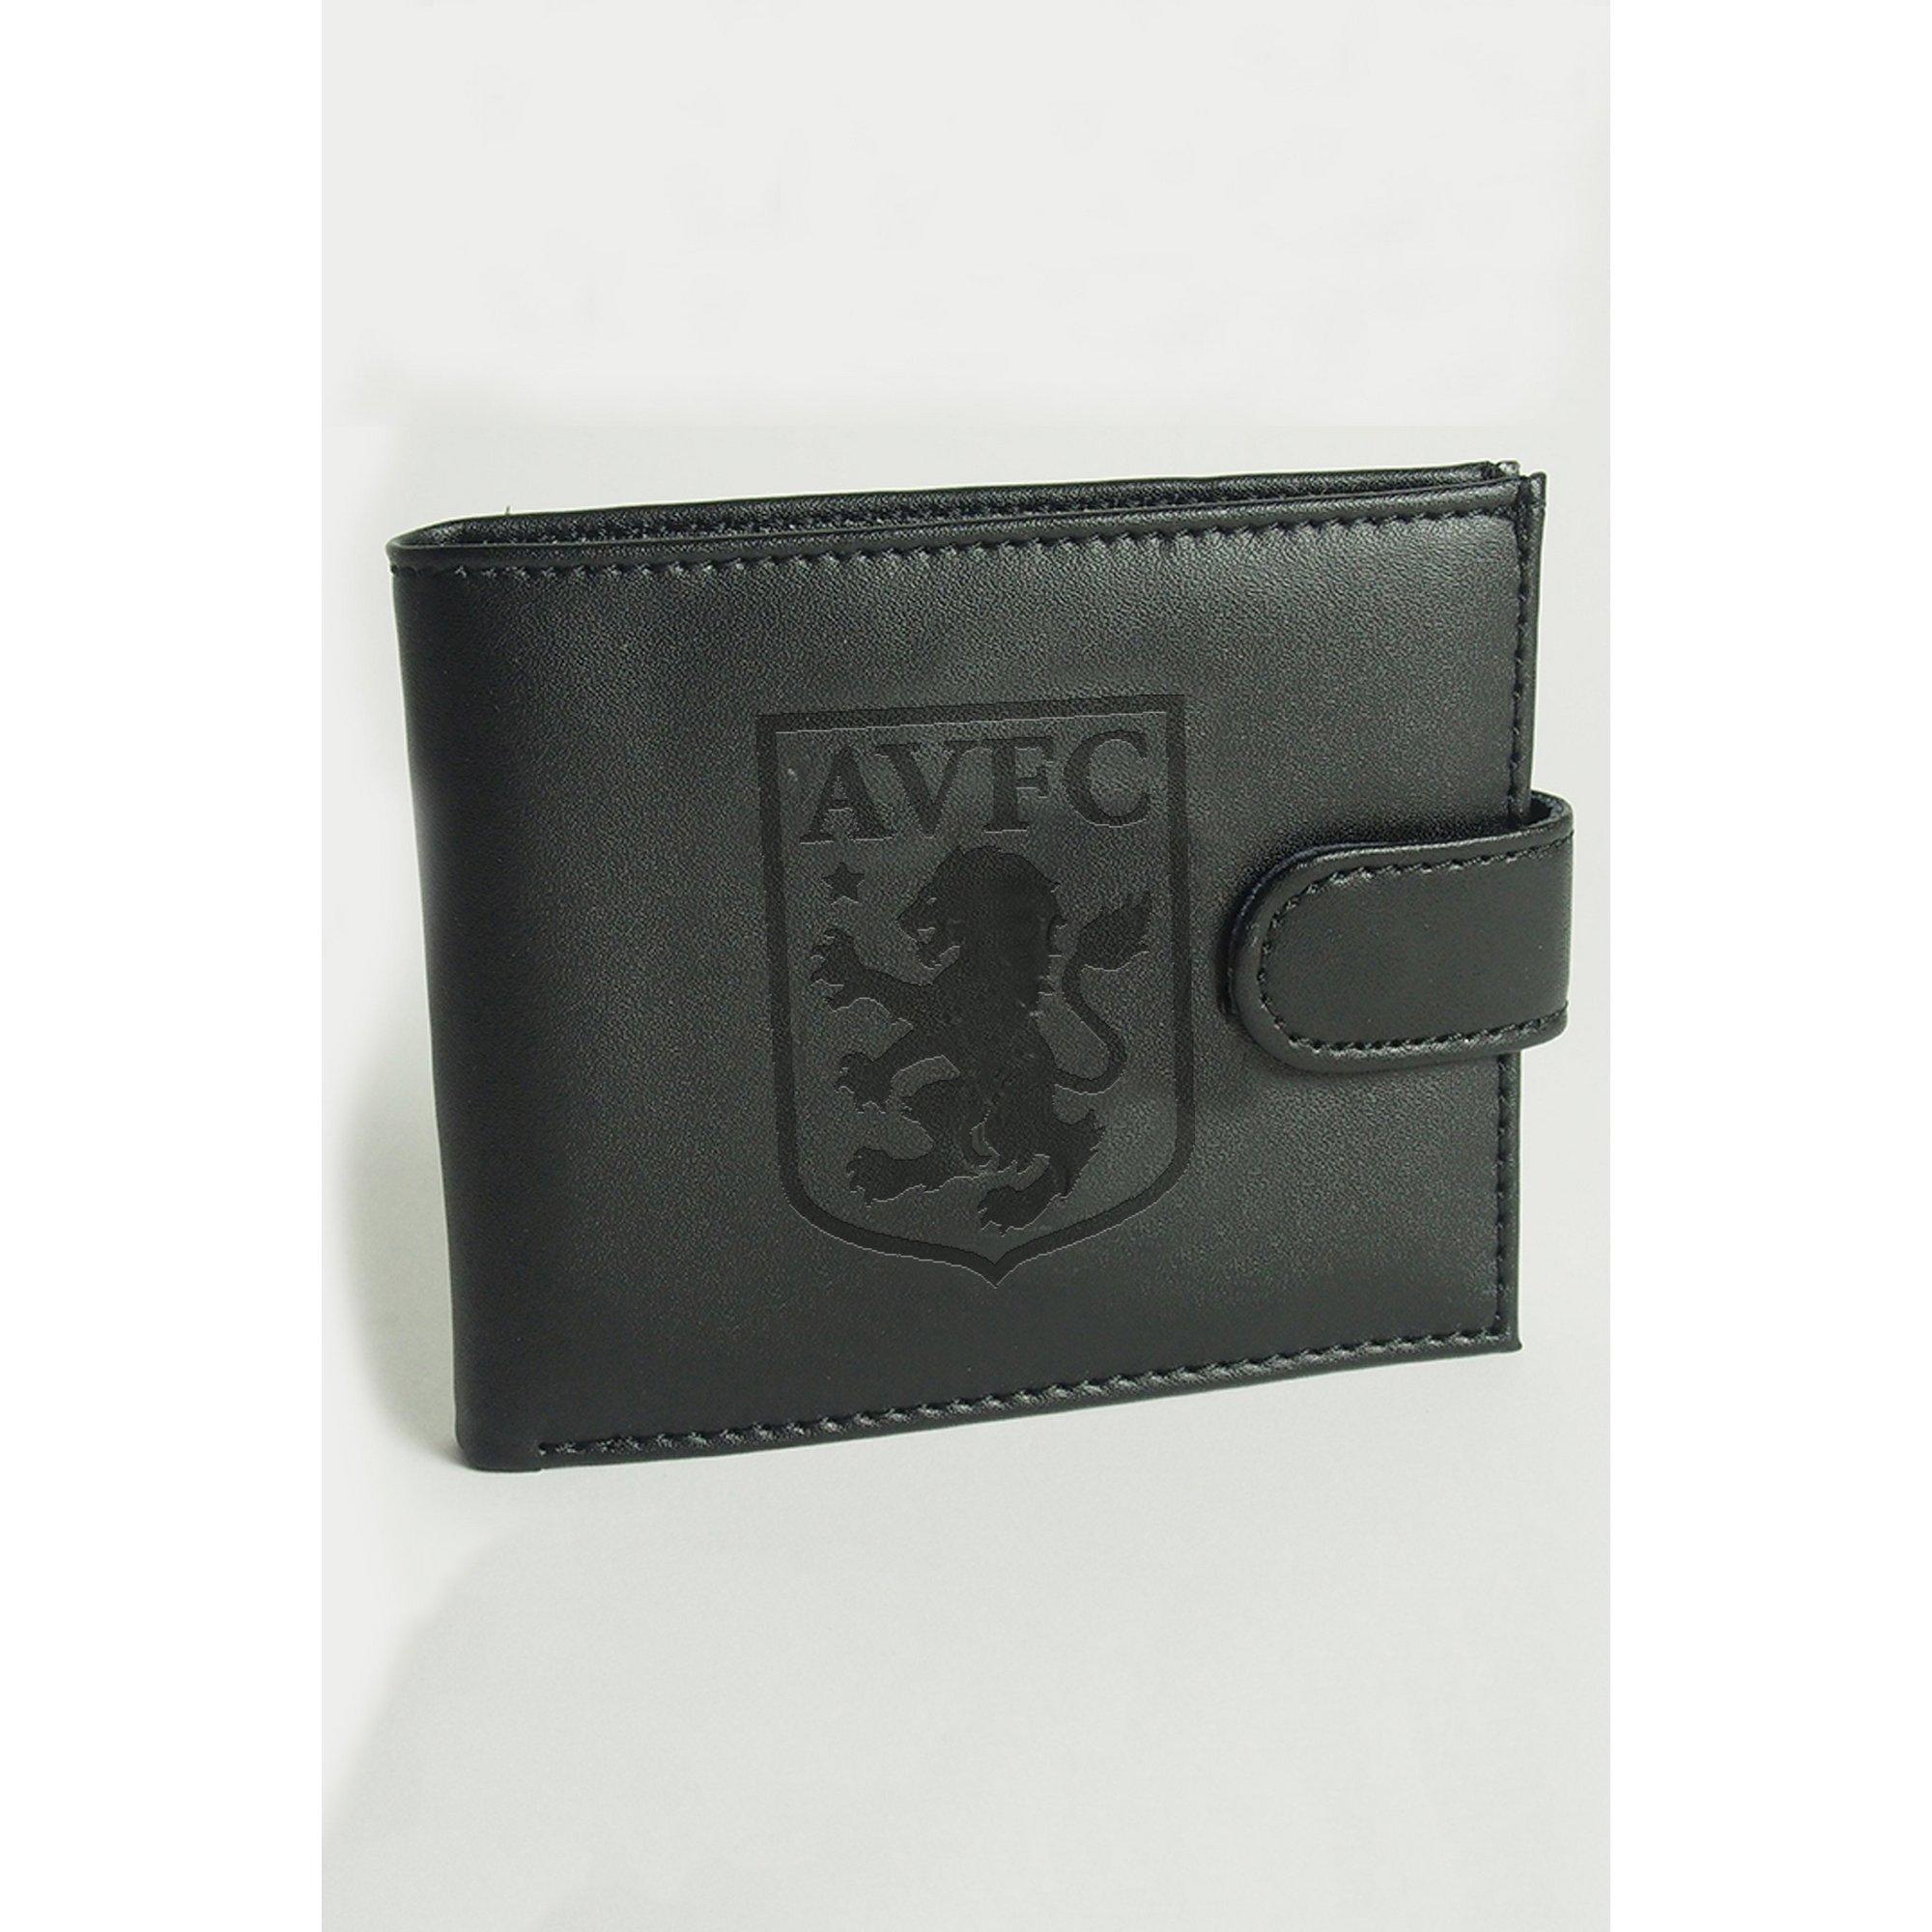 Image of Aston Villa Leather Wallet